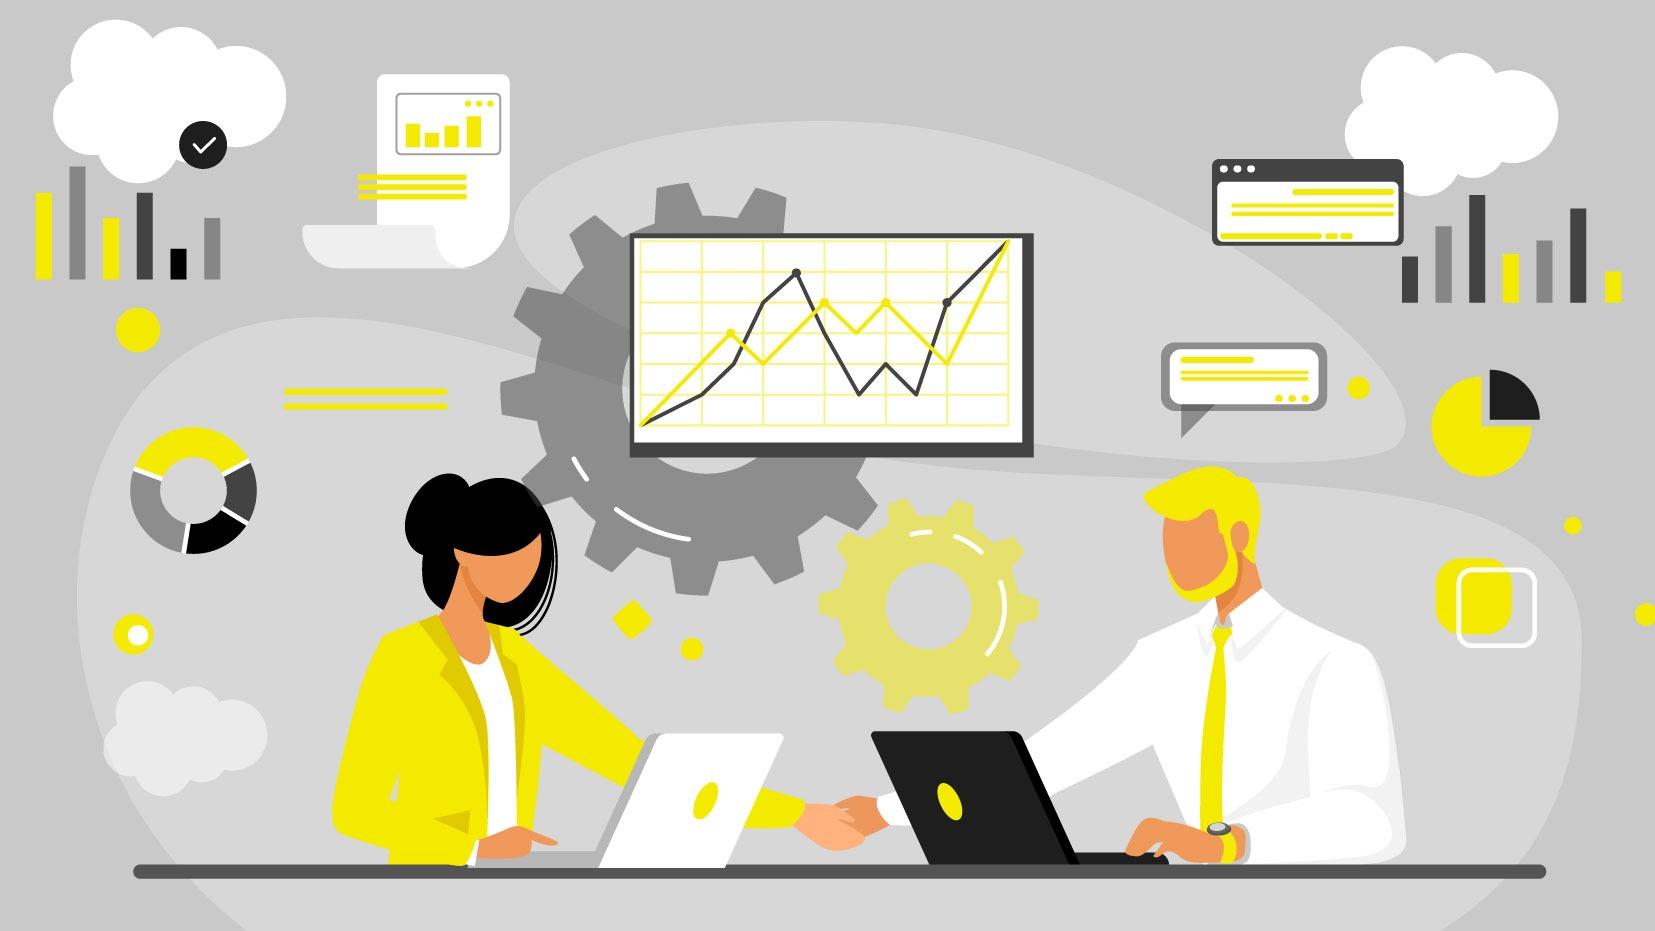 B2B Pivoting Towards B2C's Higher Digital Experience